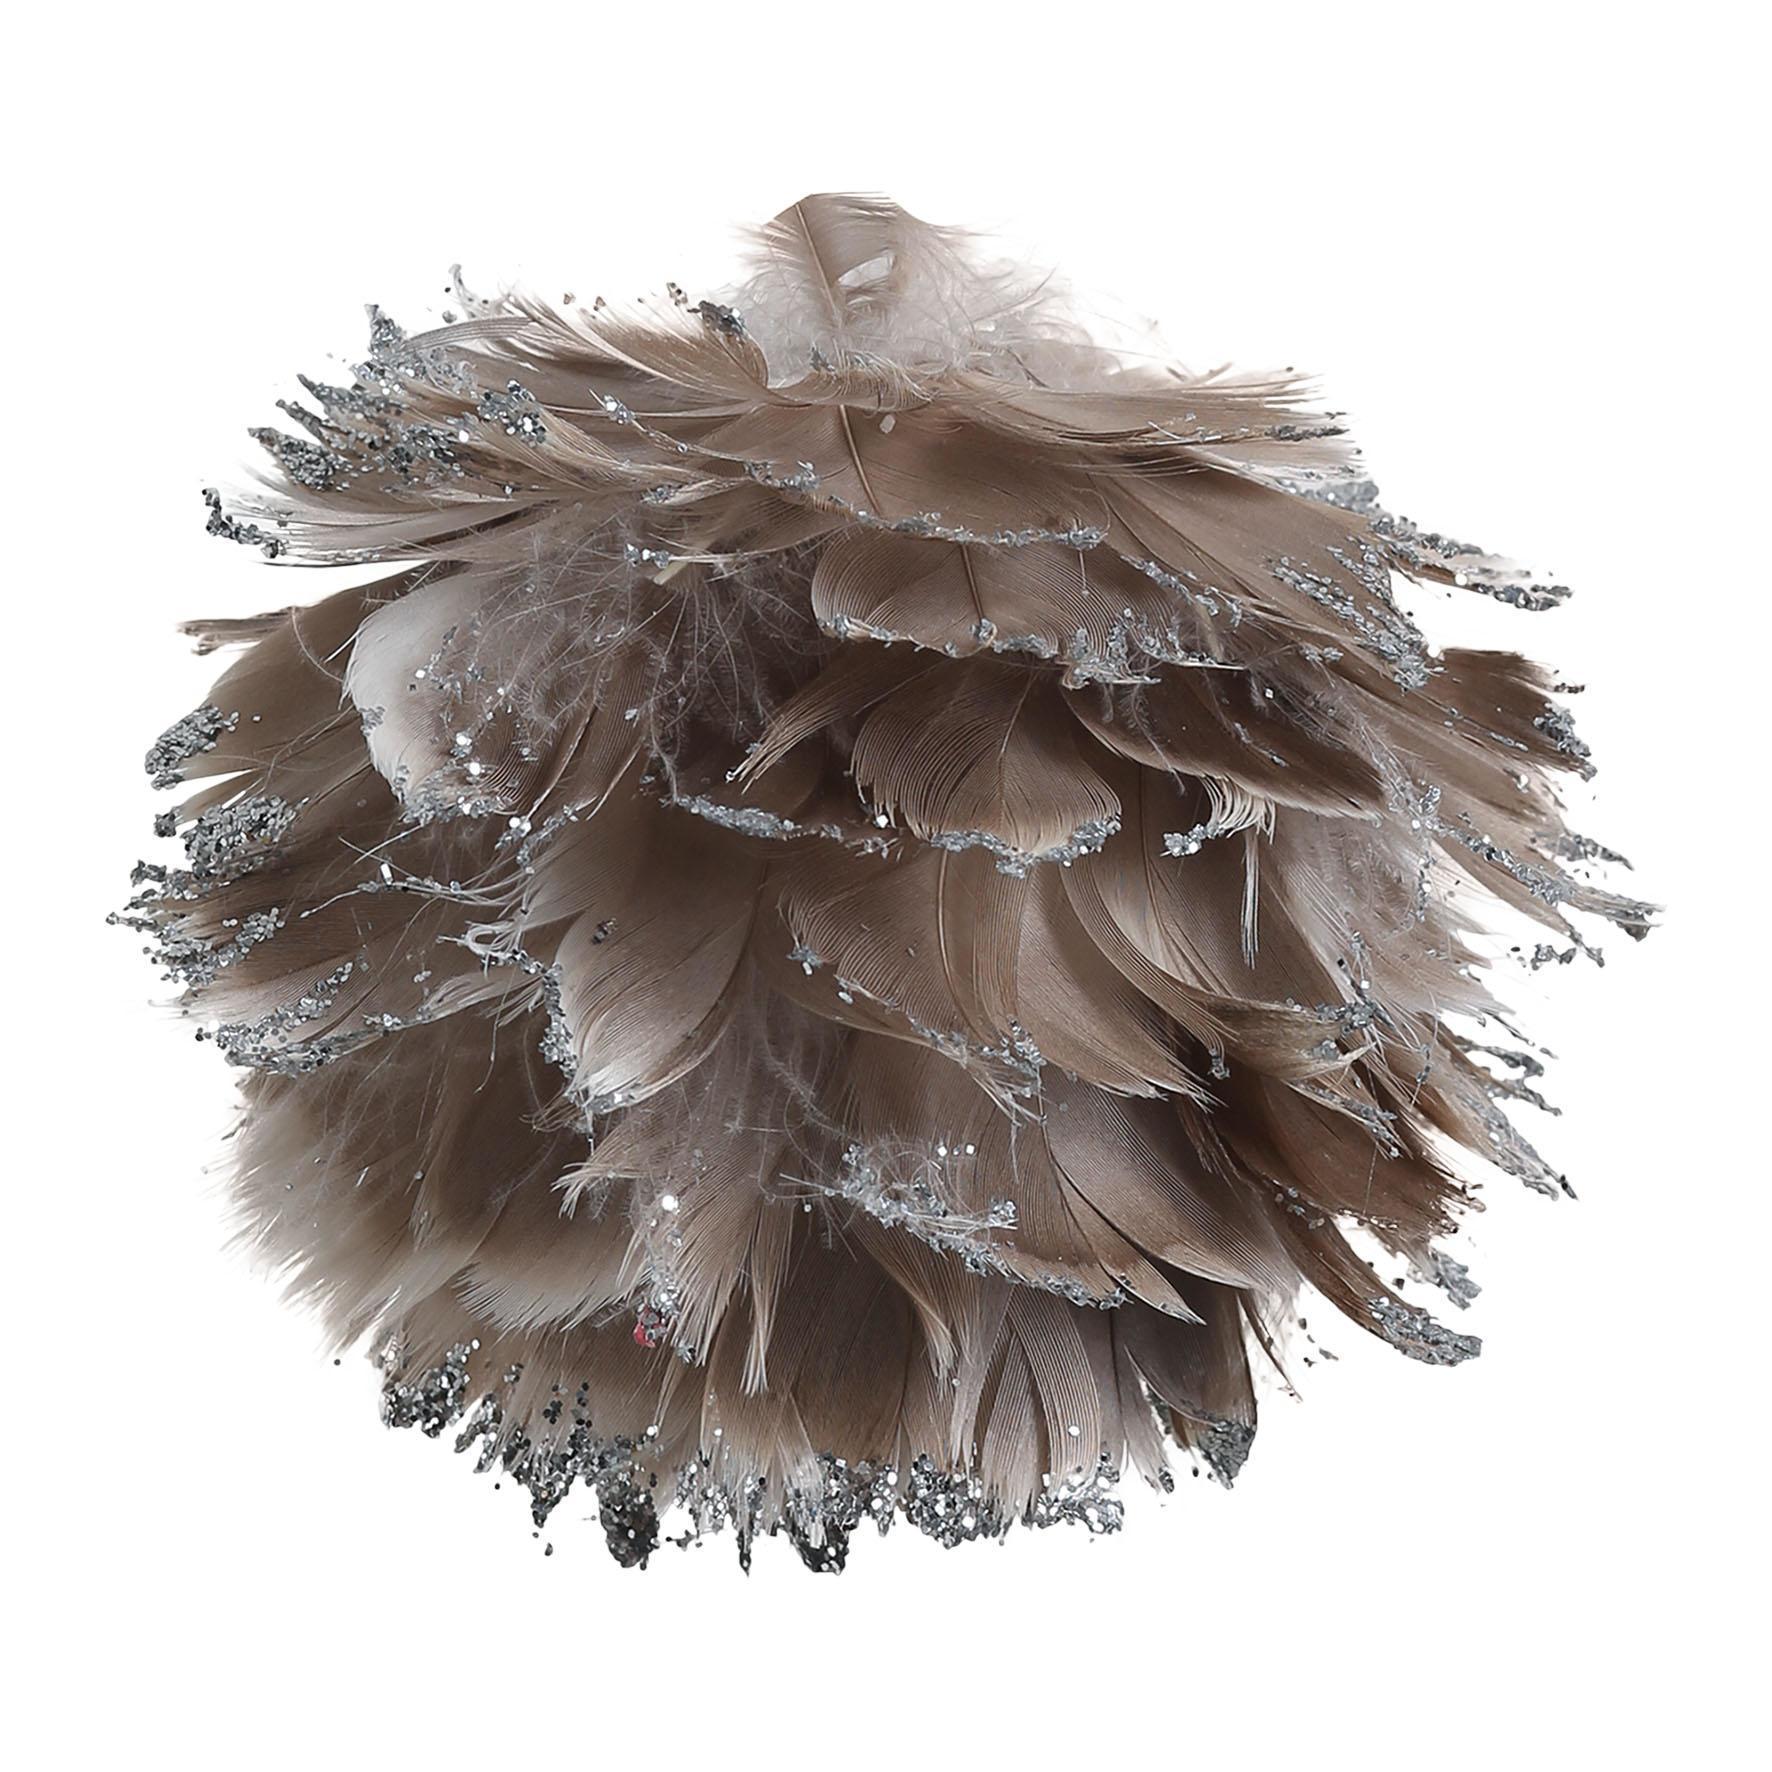 CÔTÉ TABLE Závěsná dekorace Plume gris - menší, šedá barva, hnědá barva, stříbrná barva